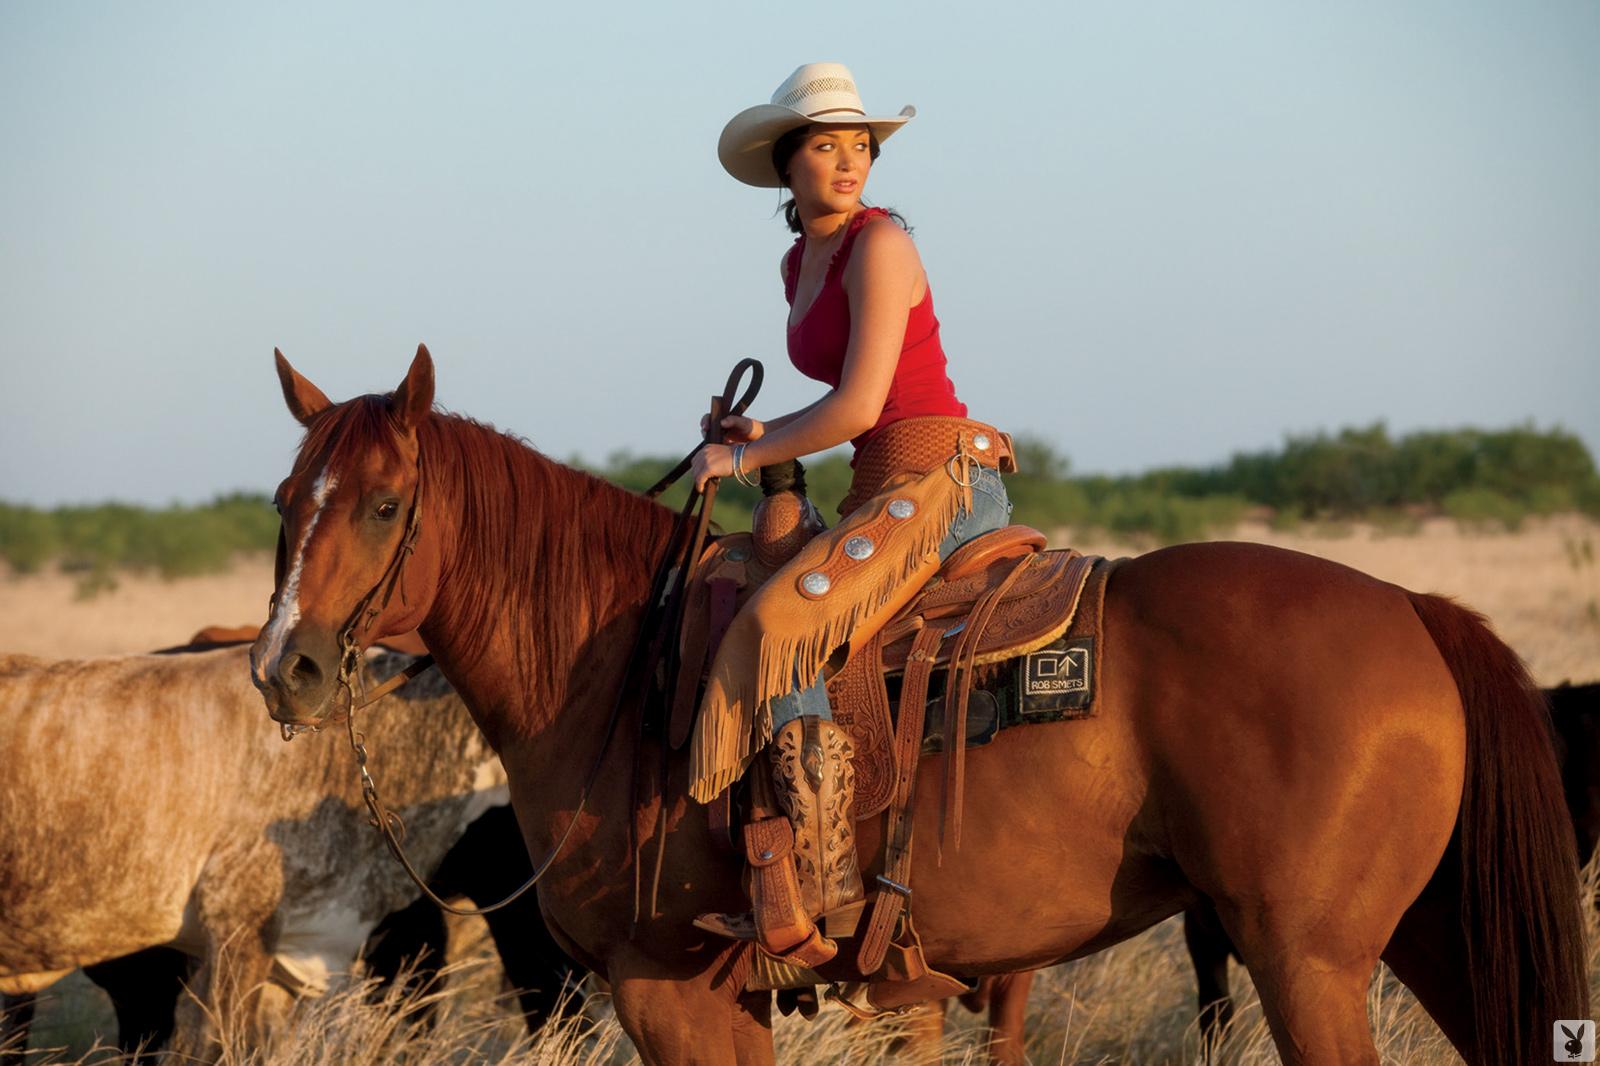 rainy-day-jordan-barn-naked-cowgirl-ranch-playboy-03